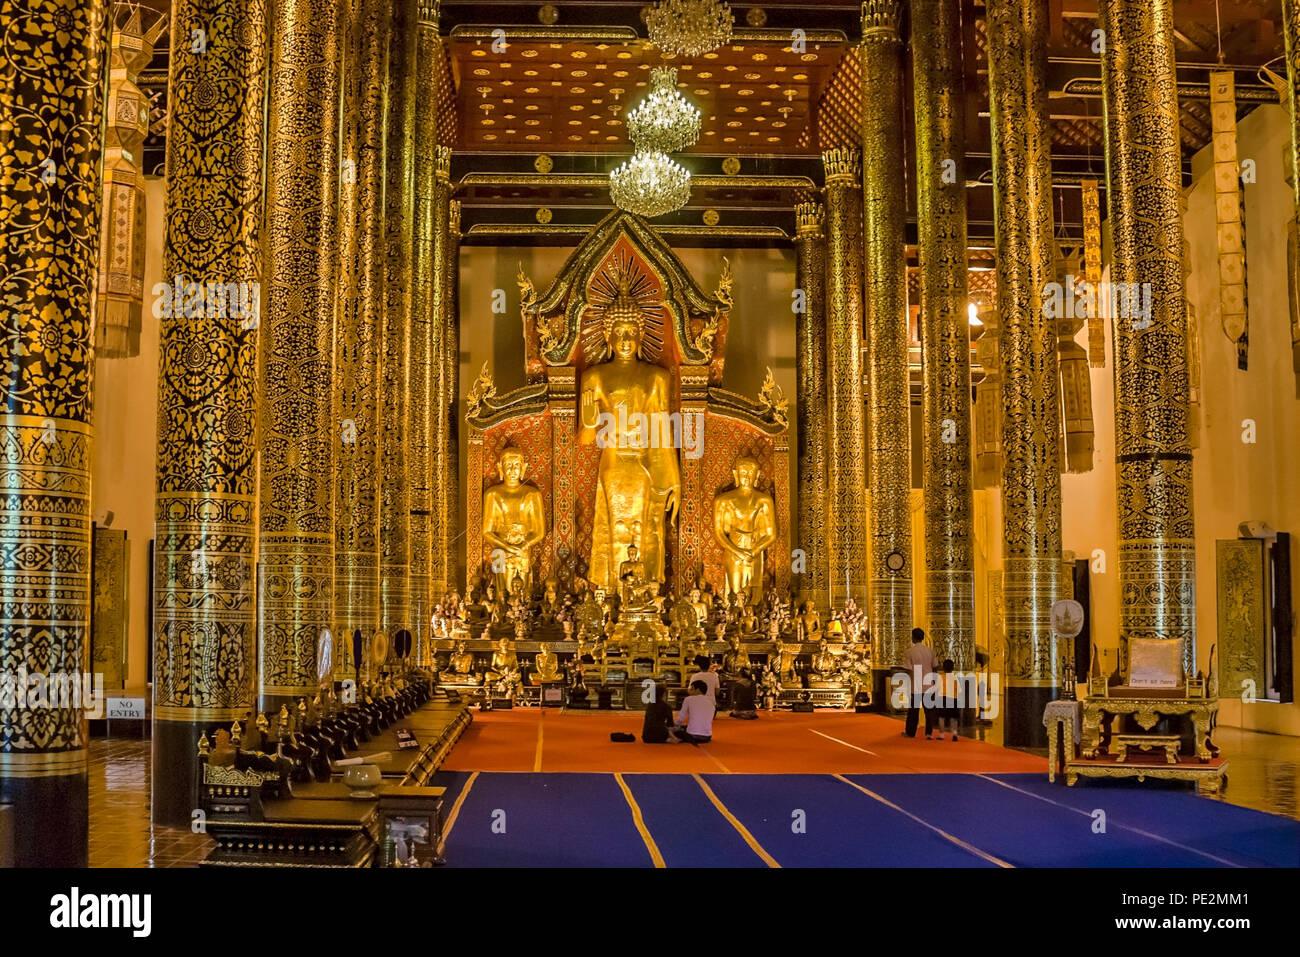 Golden Buddha inside Wat Chedi Luang, Chiang Mai, Northern Thailand | Goldener Buddha im Wat Chedi Luang, Chiang Mai, Nordthailand - Stock Image